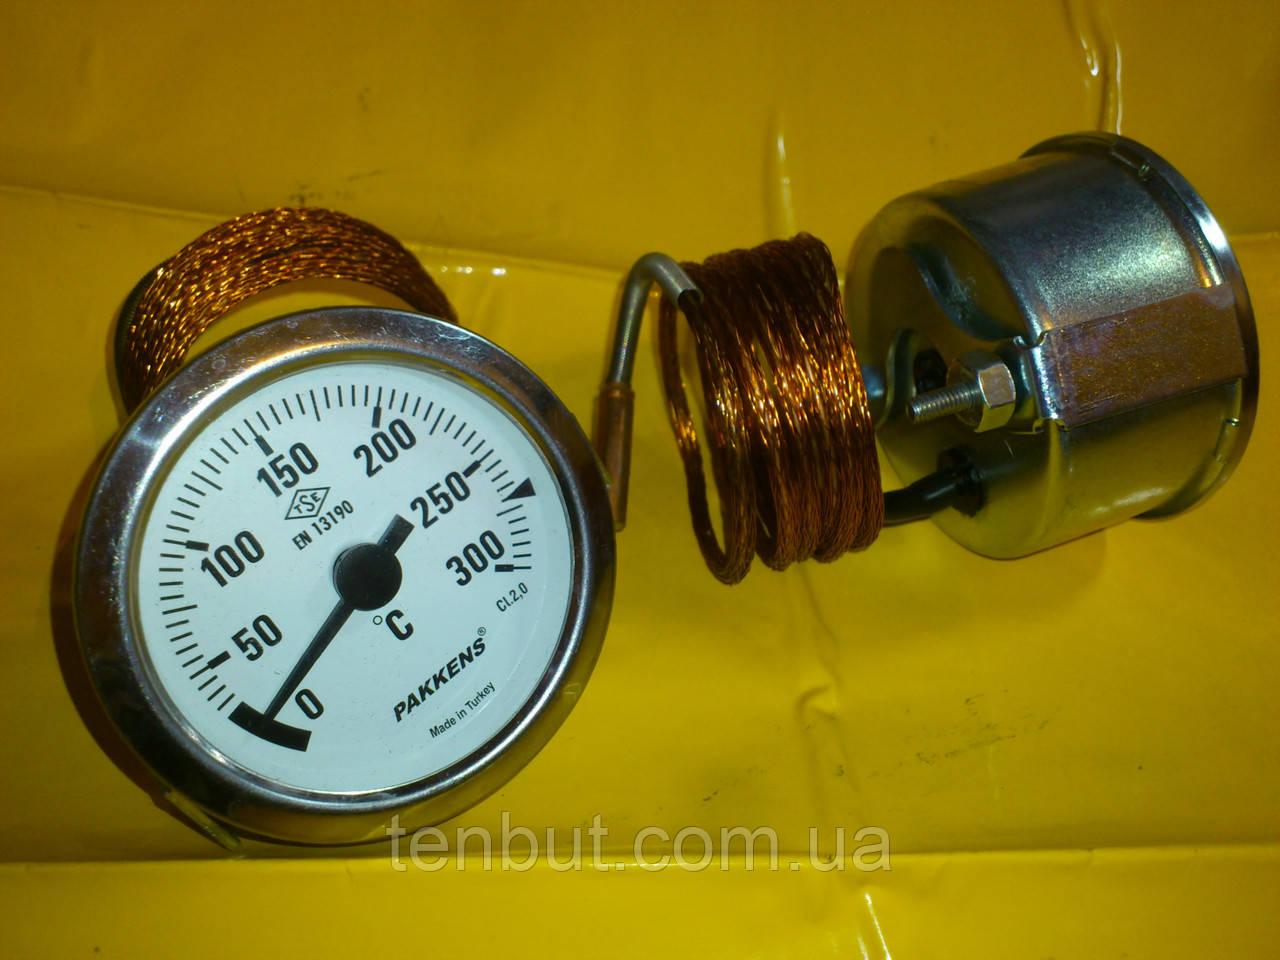 Термометр металлический 300 ℃ / Ø-60 мм. с капилляром 1-метр. PAKKENS производство Турция